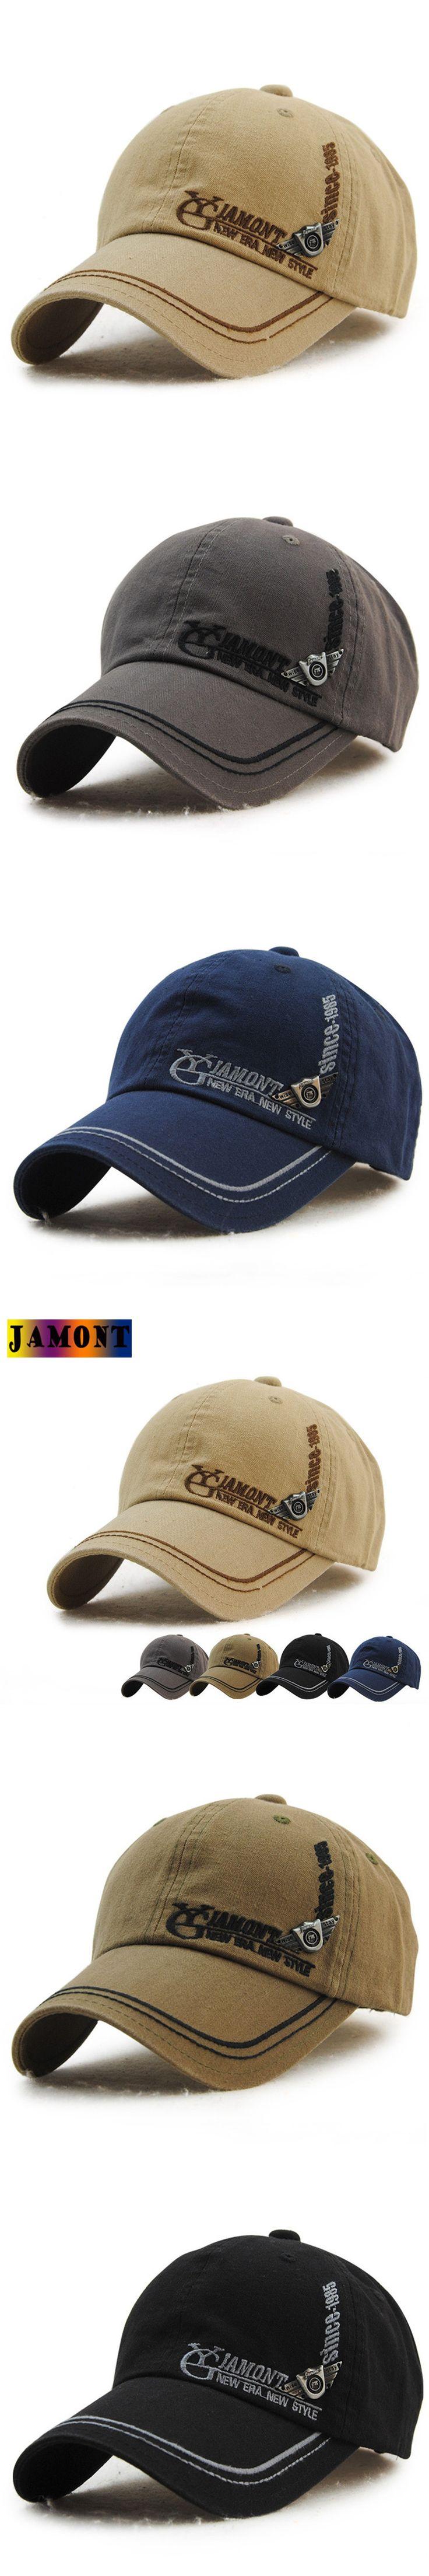 Drop Shipping 2017 Dad Hat Snapback Baseball Cap Trucker Women Men Hip Hop Caps Cotton Casual Drake Hat Bones Casquette Gorras